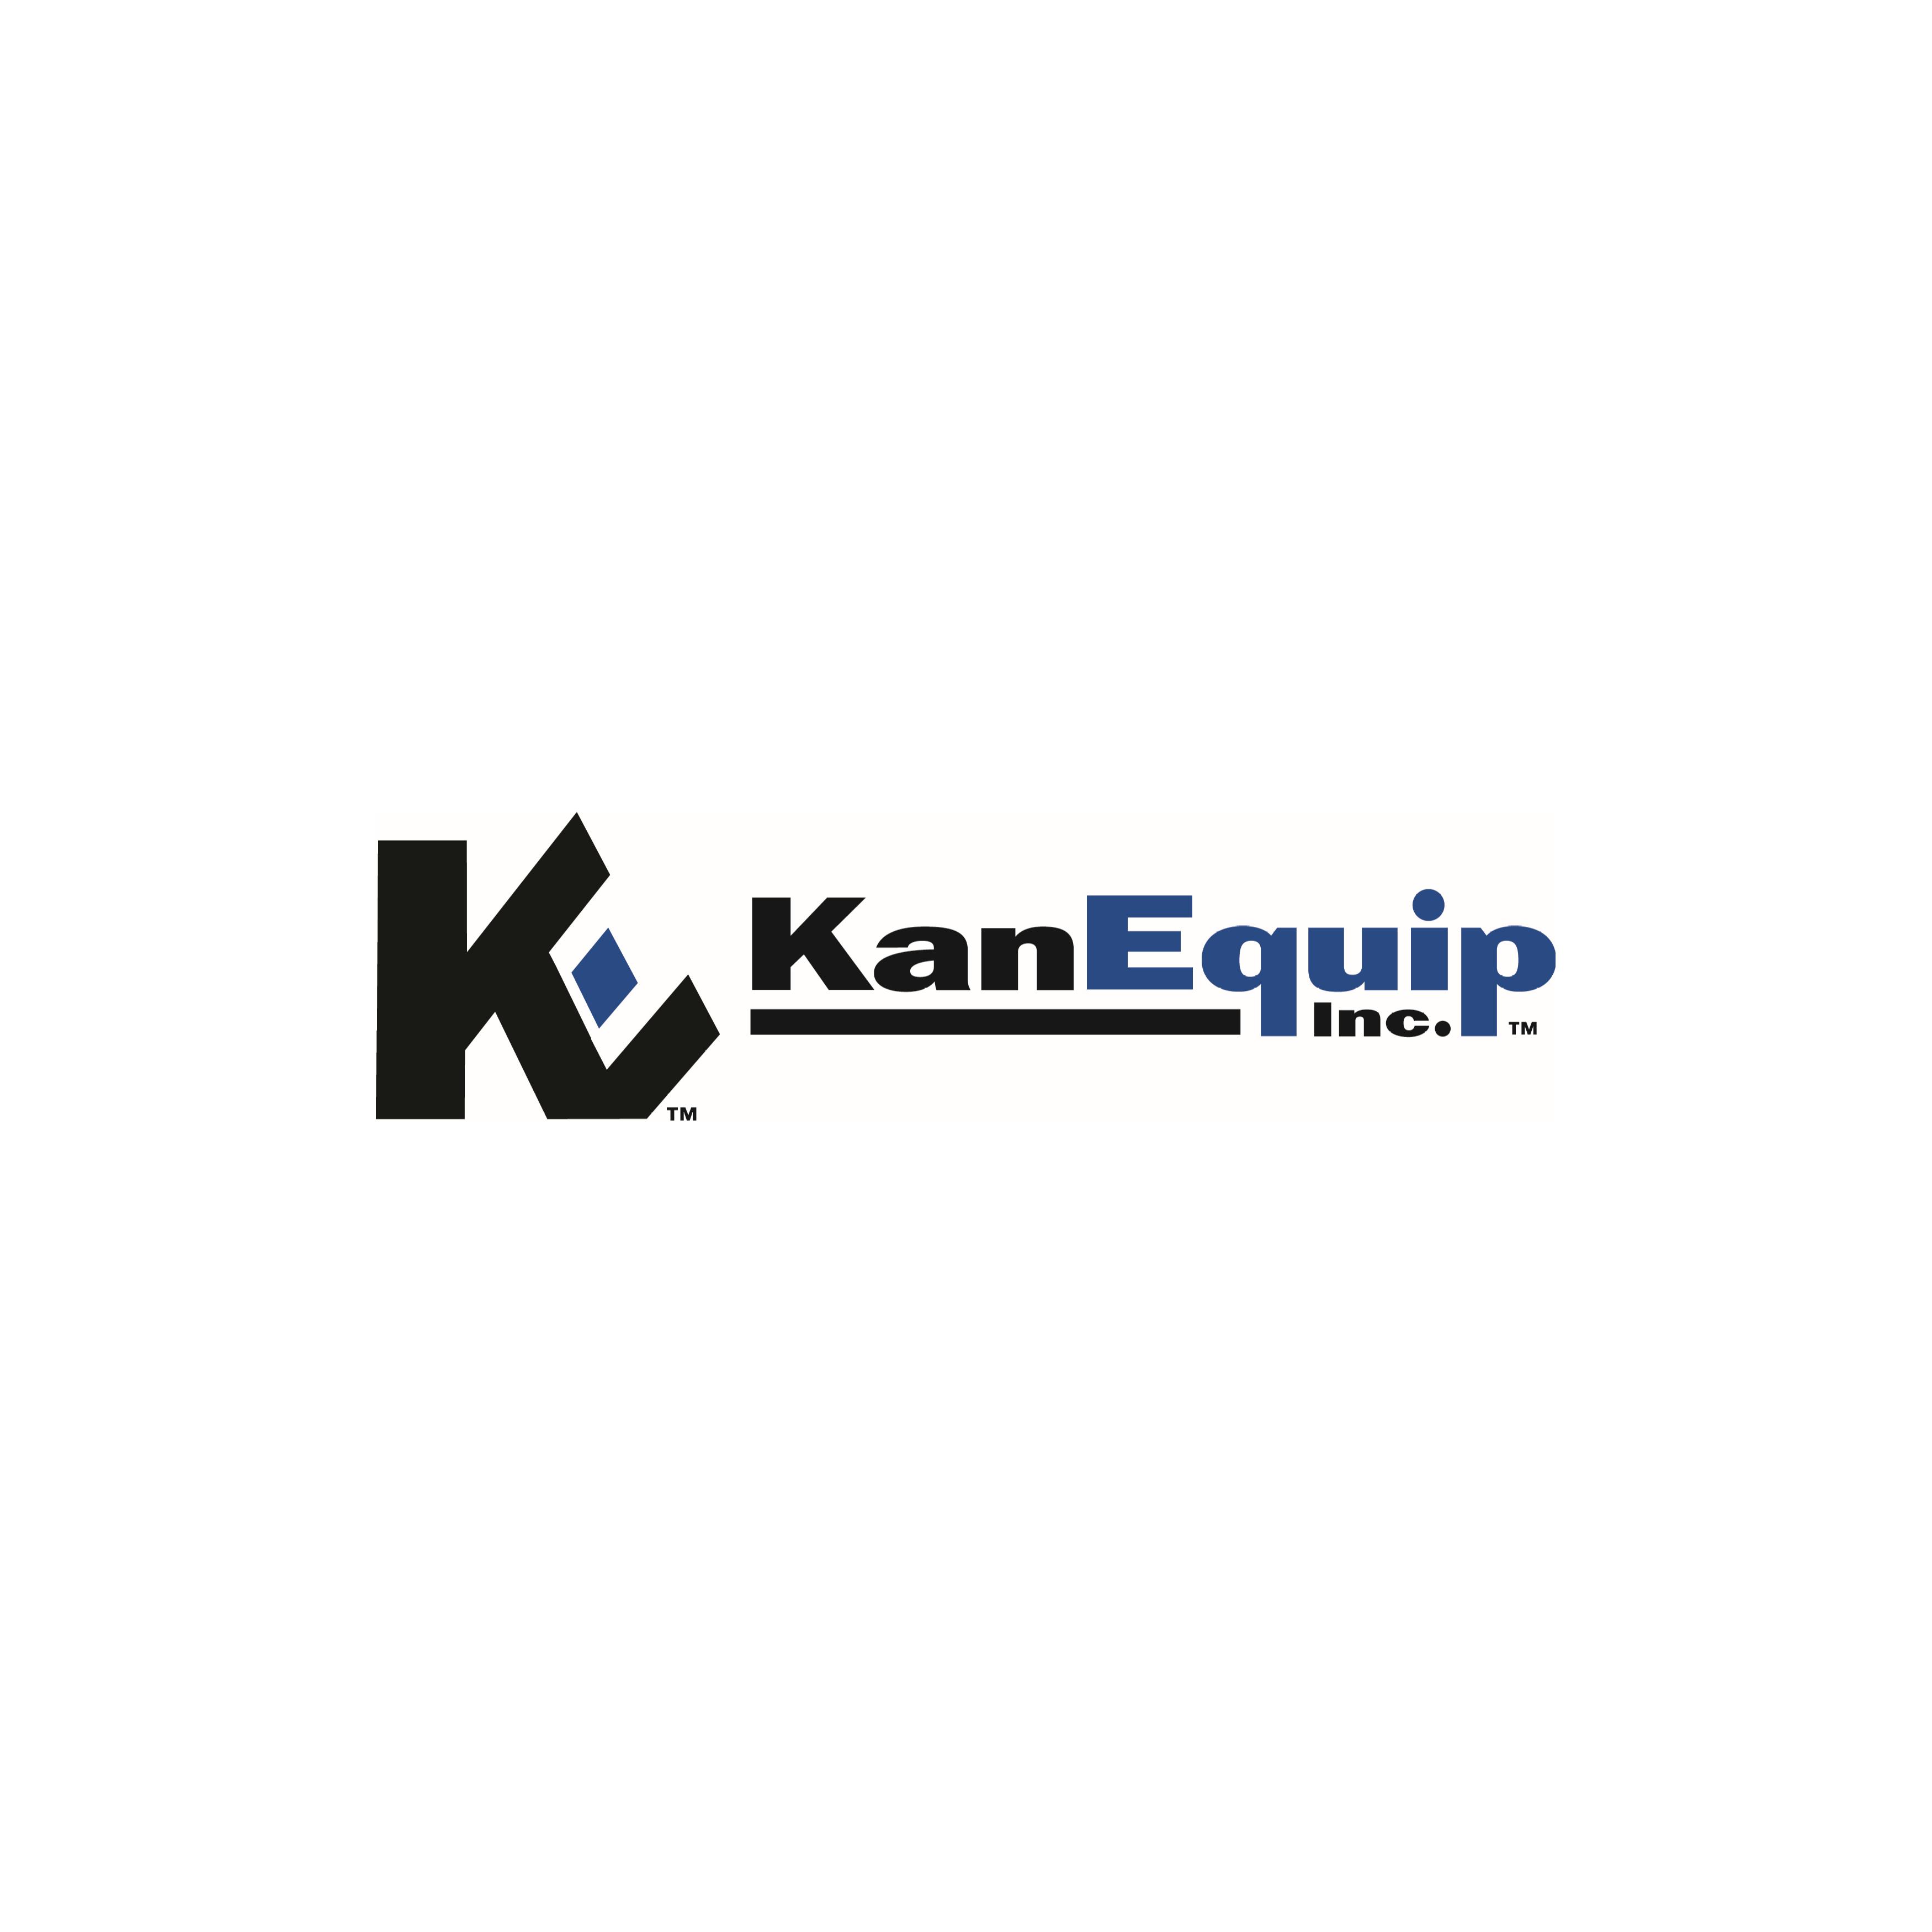 KanEquip Inc.